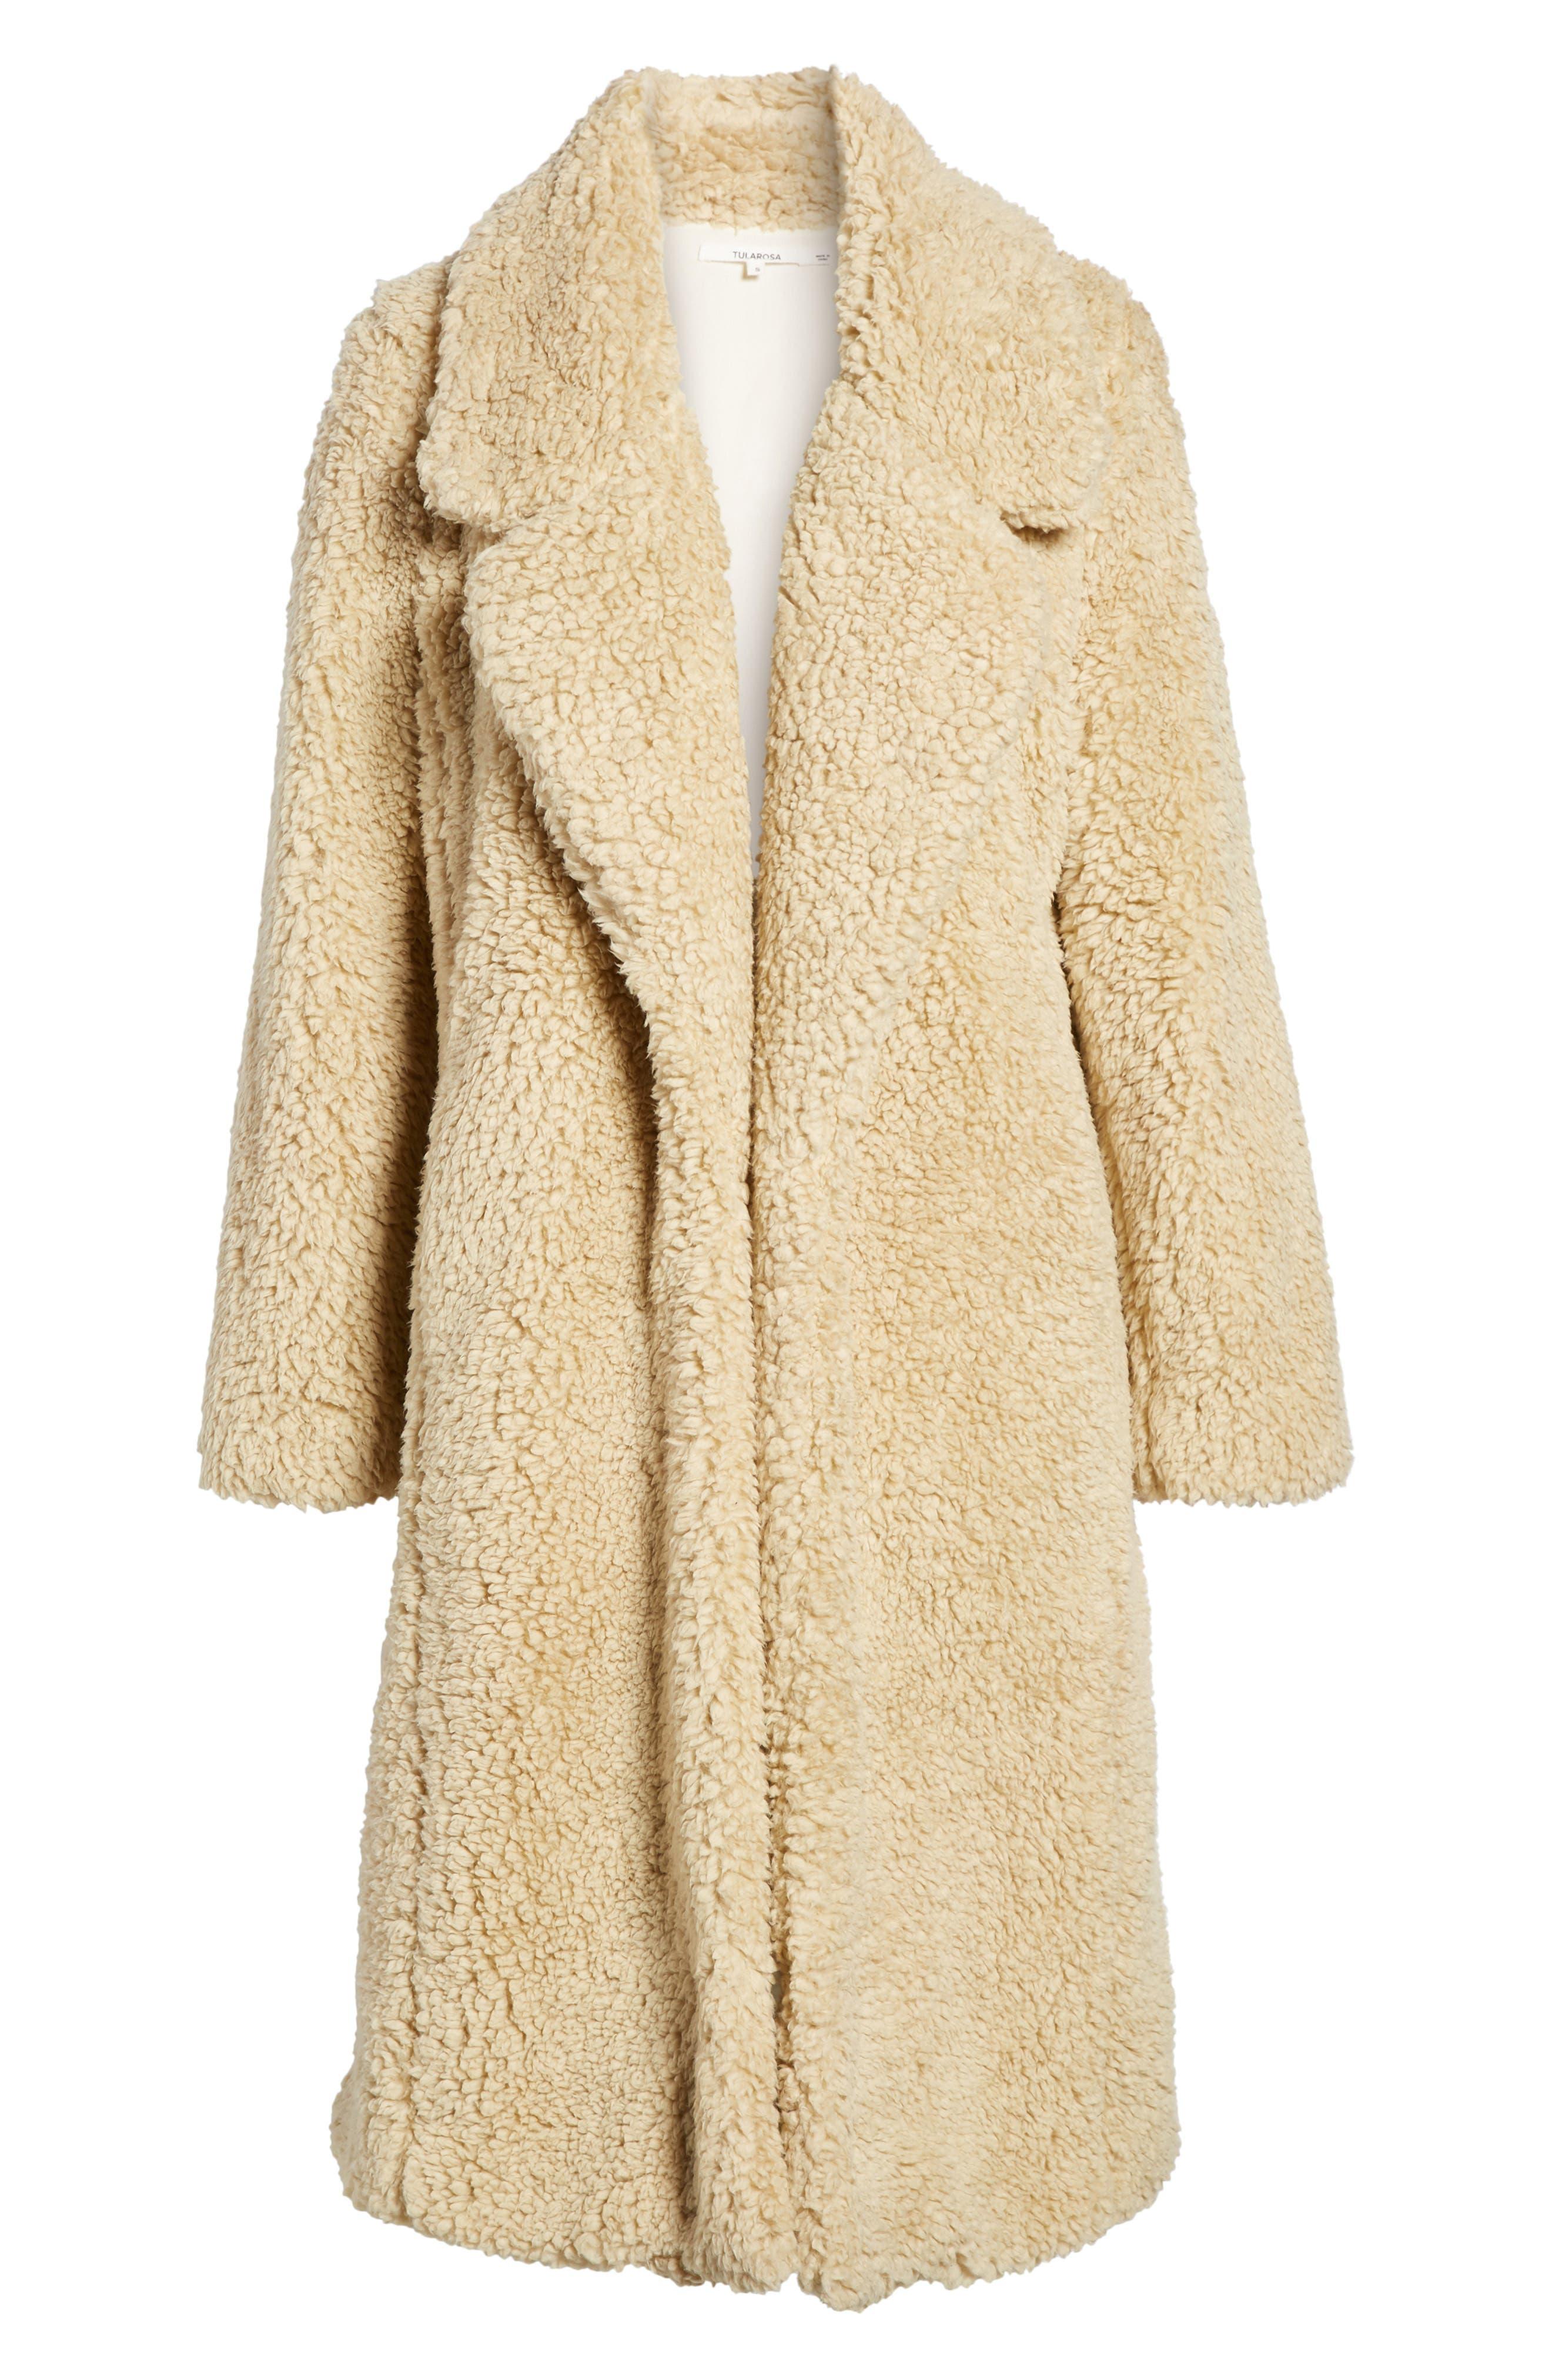 Violet Teddy Bear Coat,                             Alternate thumbnail 5, color,                             250